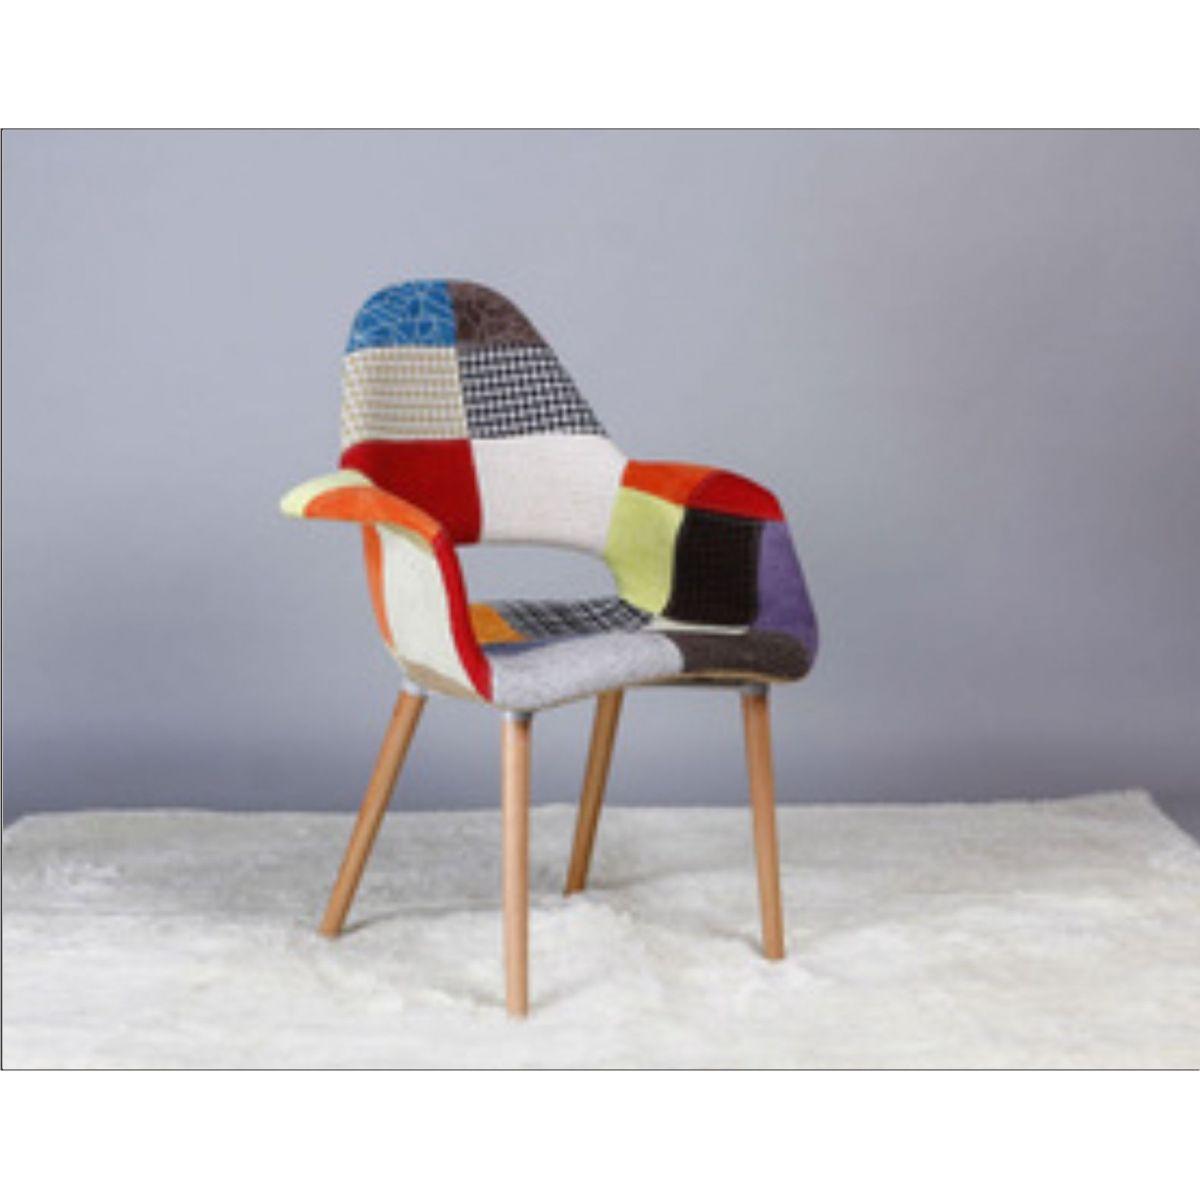 Kit 4 Cadeiras Charles Eames Patchwork Orgânica Pelegrin FW-073F